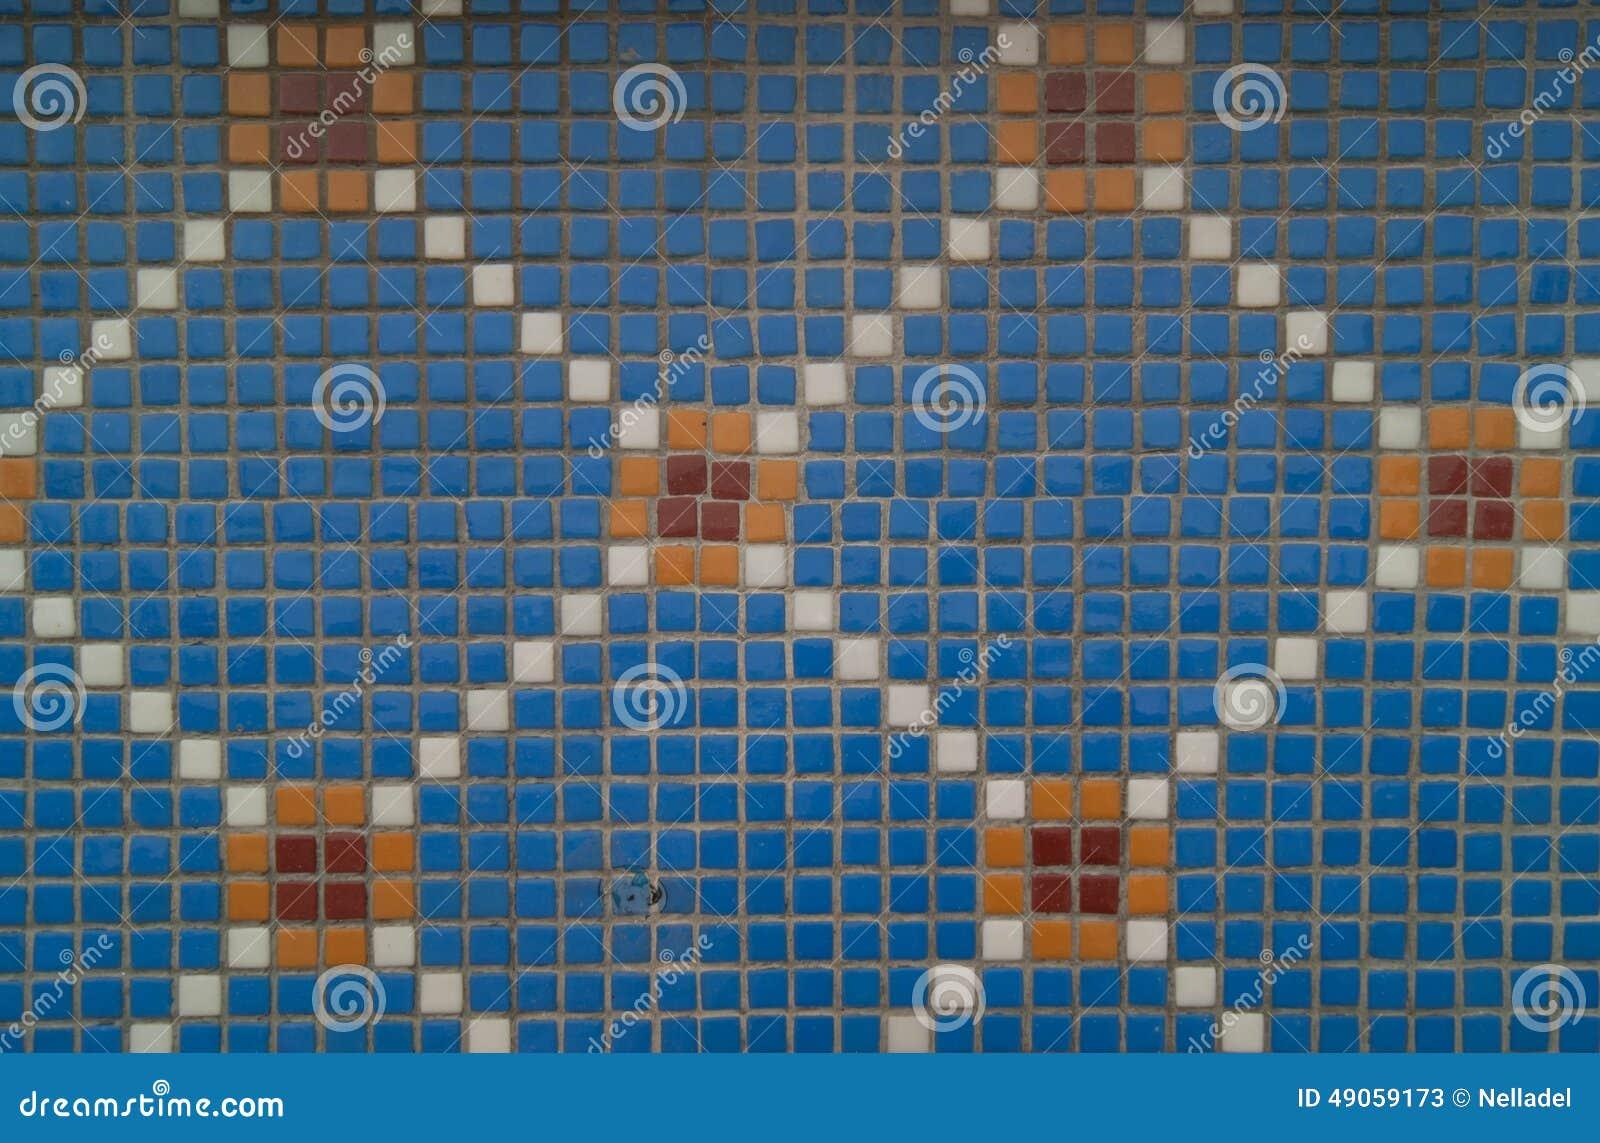 Blue mosaic tile stock image. Image of mosaic, design - 49059173